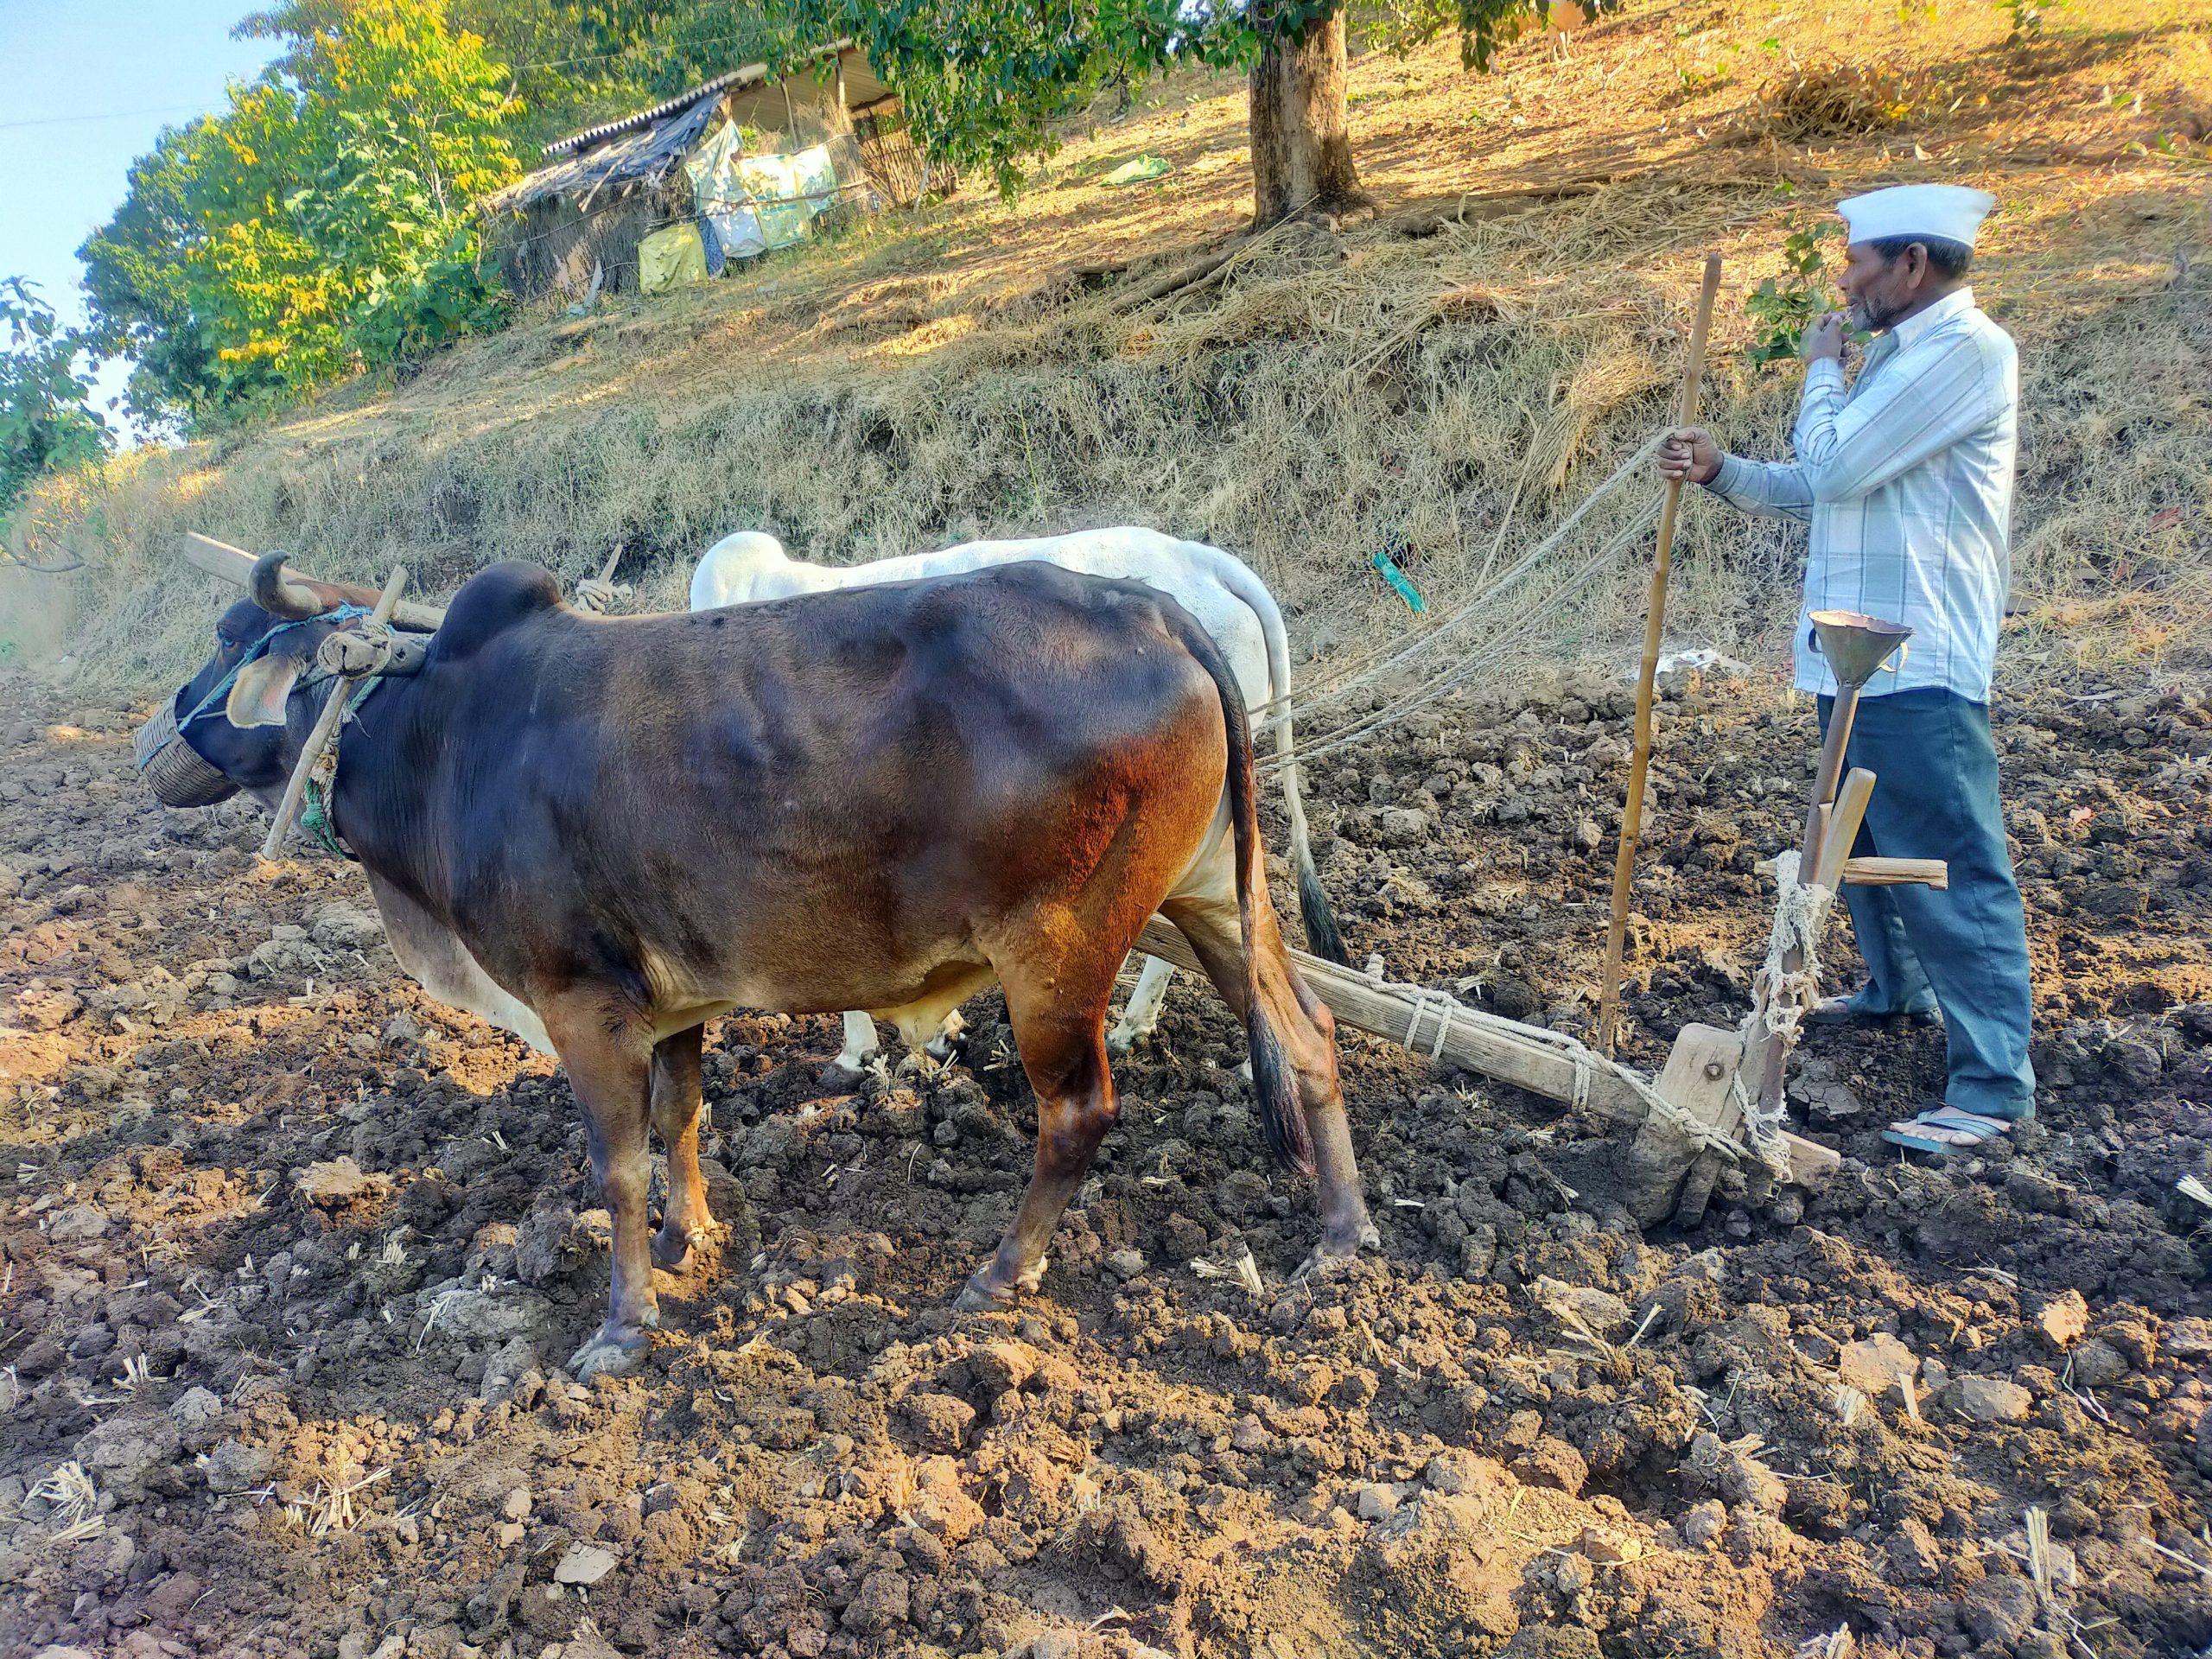 A farmer plough his land with oxen